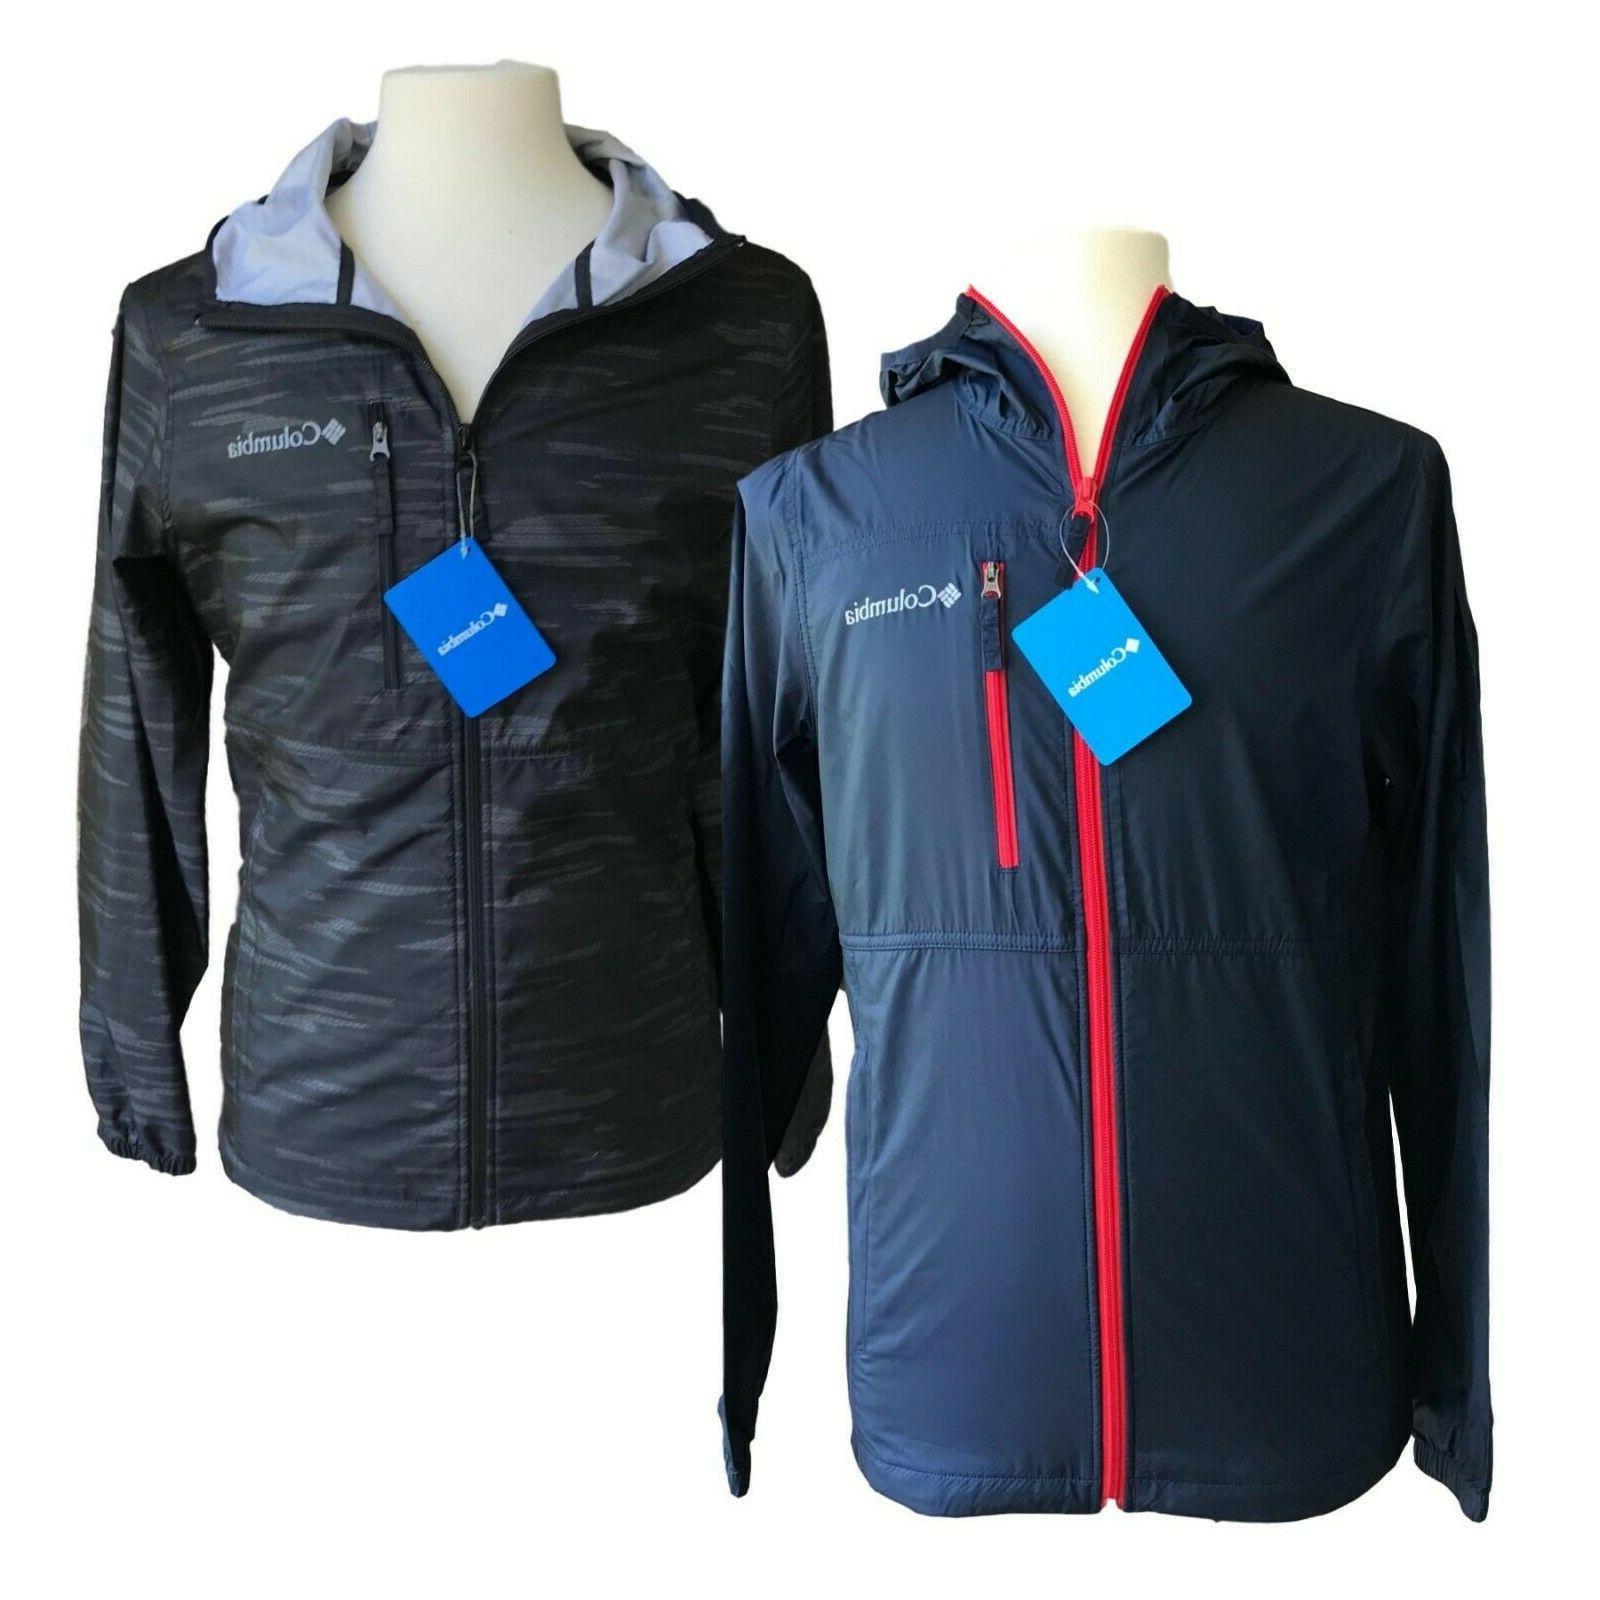 New Columbia mens light rain jacket windreaker